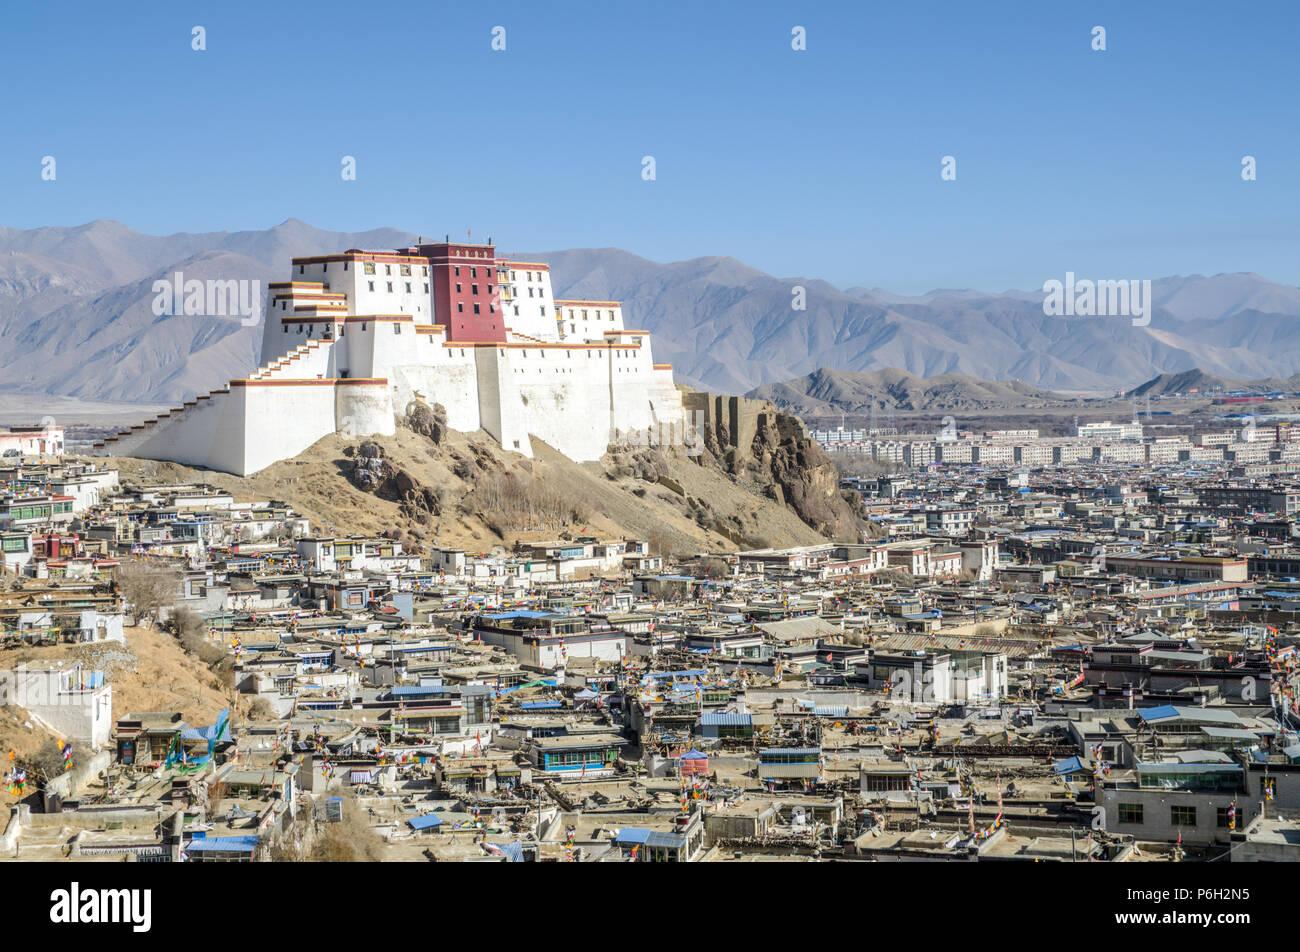 Shigatse Dzong (Samdruptse Dzong), Shigatse, Tibet - Stock Image